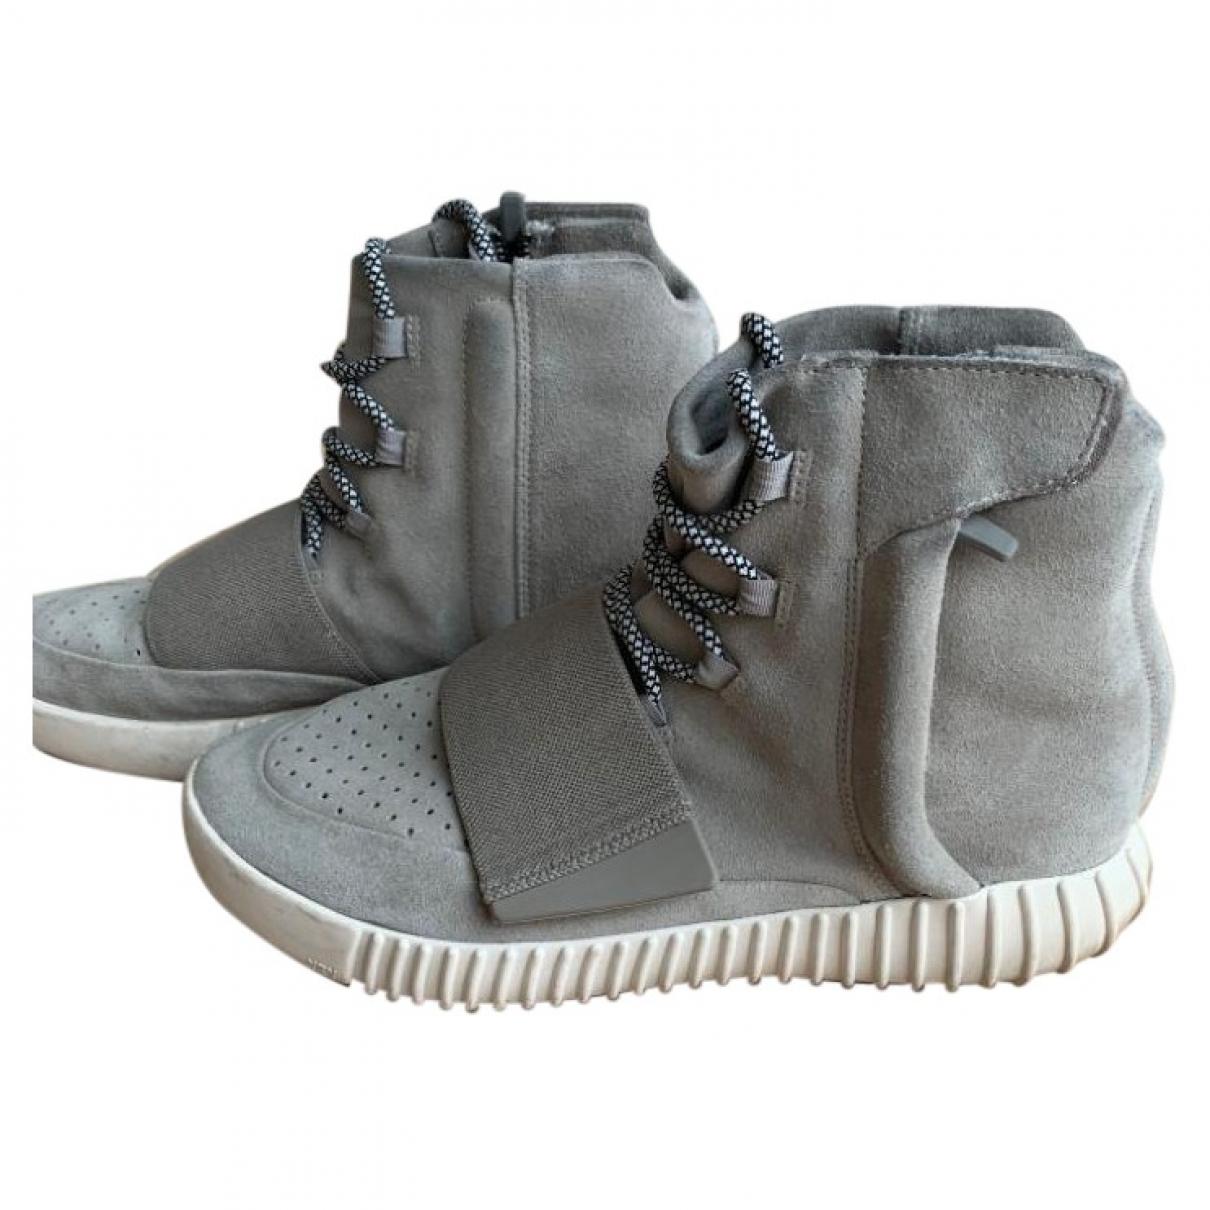 Yeezy X Adidas - Baskets Boost 750  pour homme en suede - gris